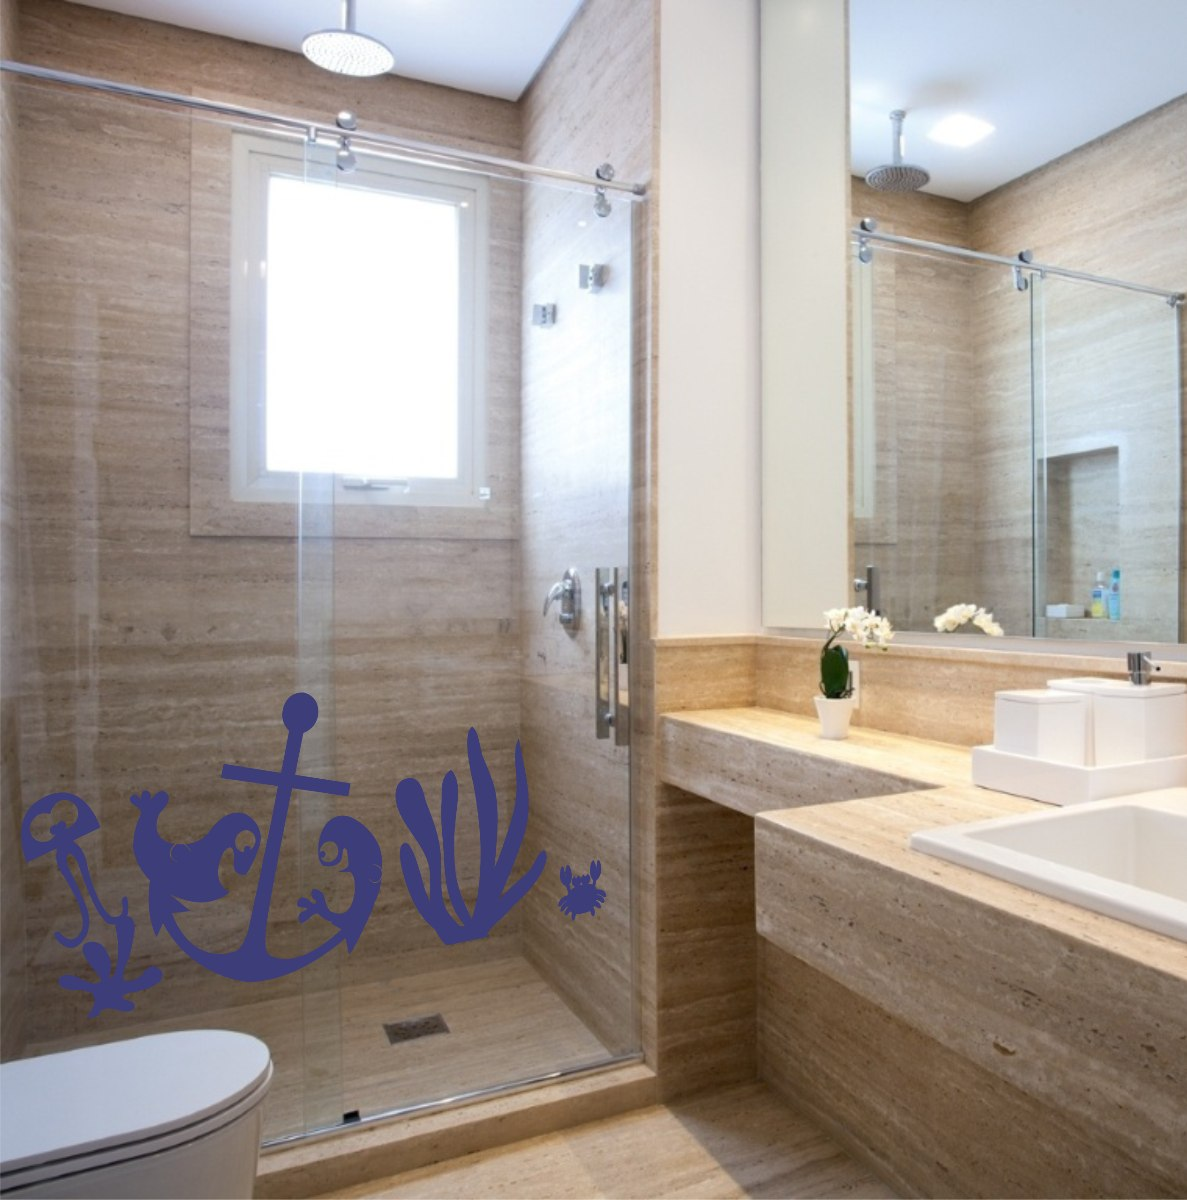 Banheiro Com Canjiquinha Pictures to pin on Pinterest -> Banheiro Pequeno Com Canjiquinha